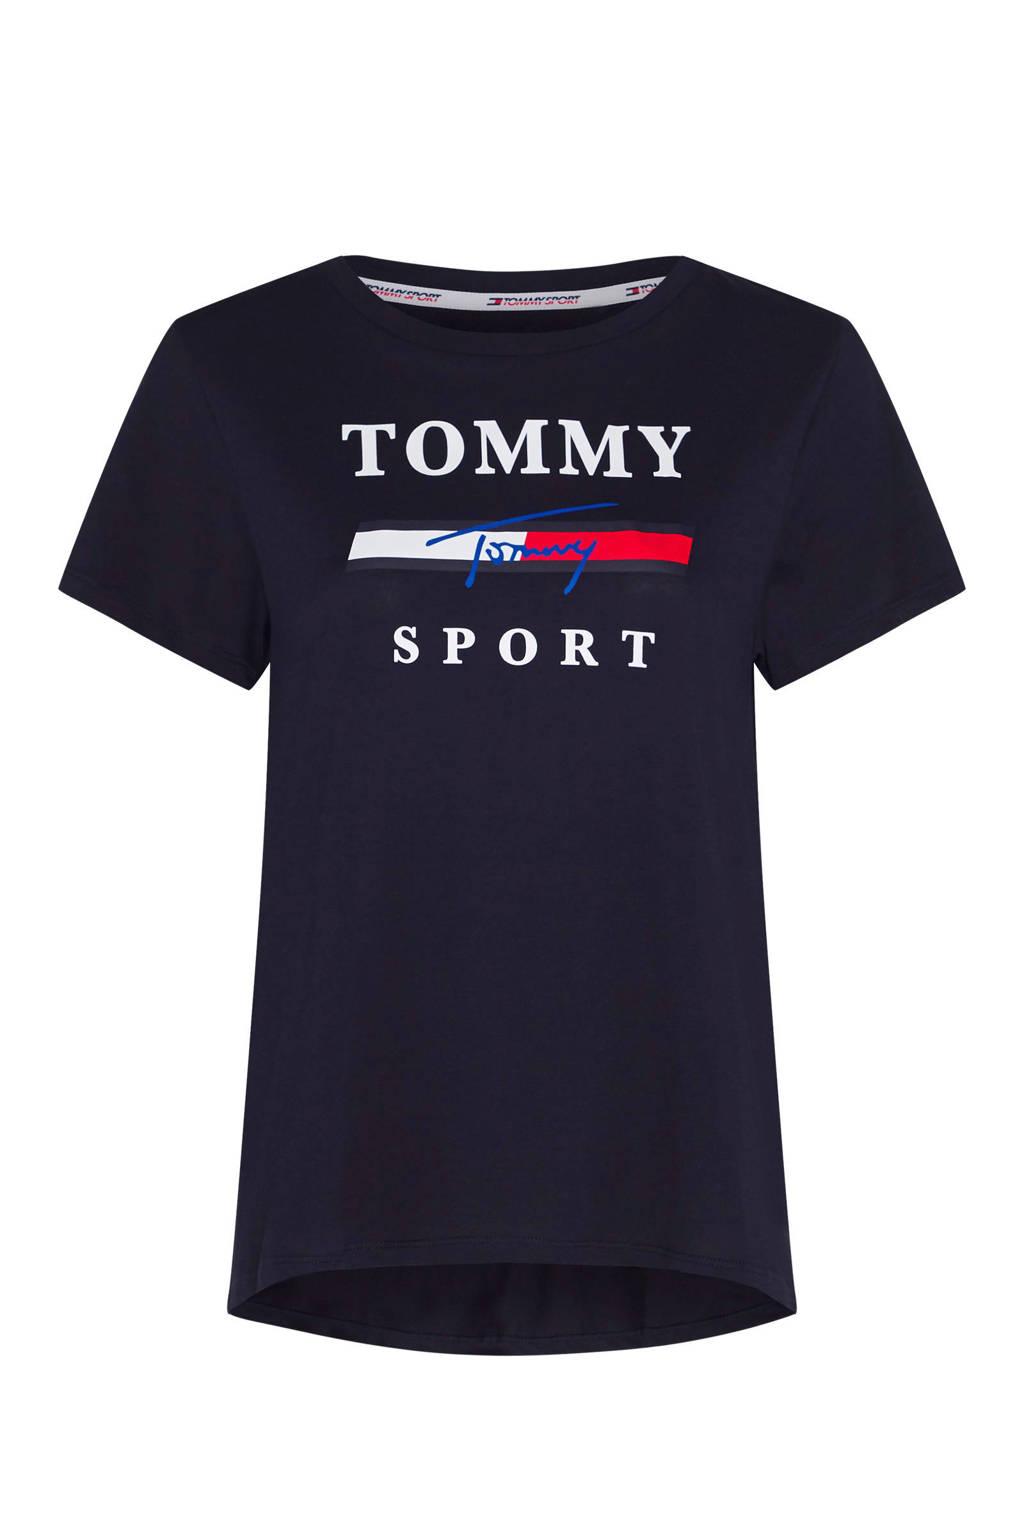 Tommy Hilfiger Sport sport T-shirt donkerblauw, Donkerblauw